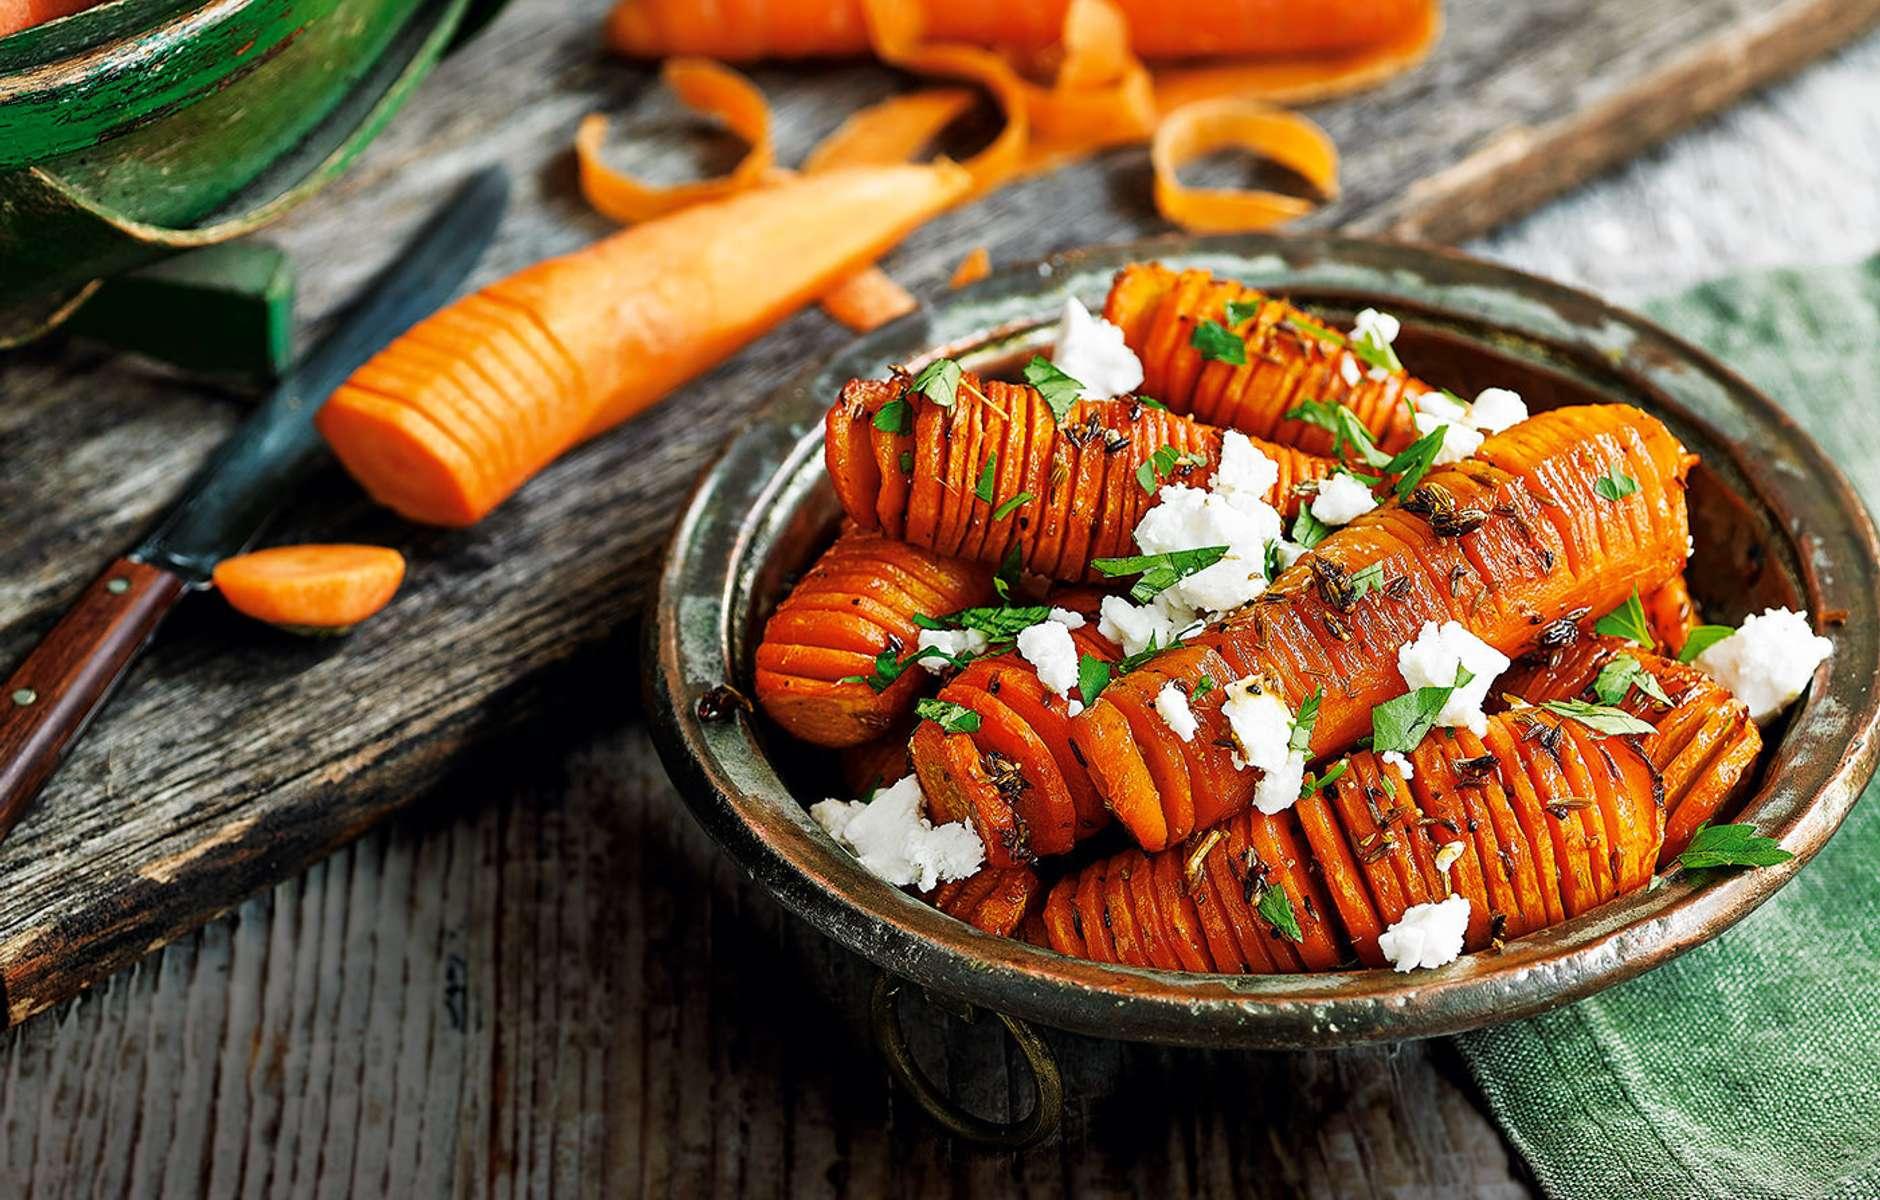 Морковь по-корейски (62 рецепта с фото) - рецепты с фотографиями на поварёнок.ру